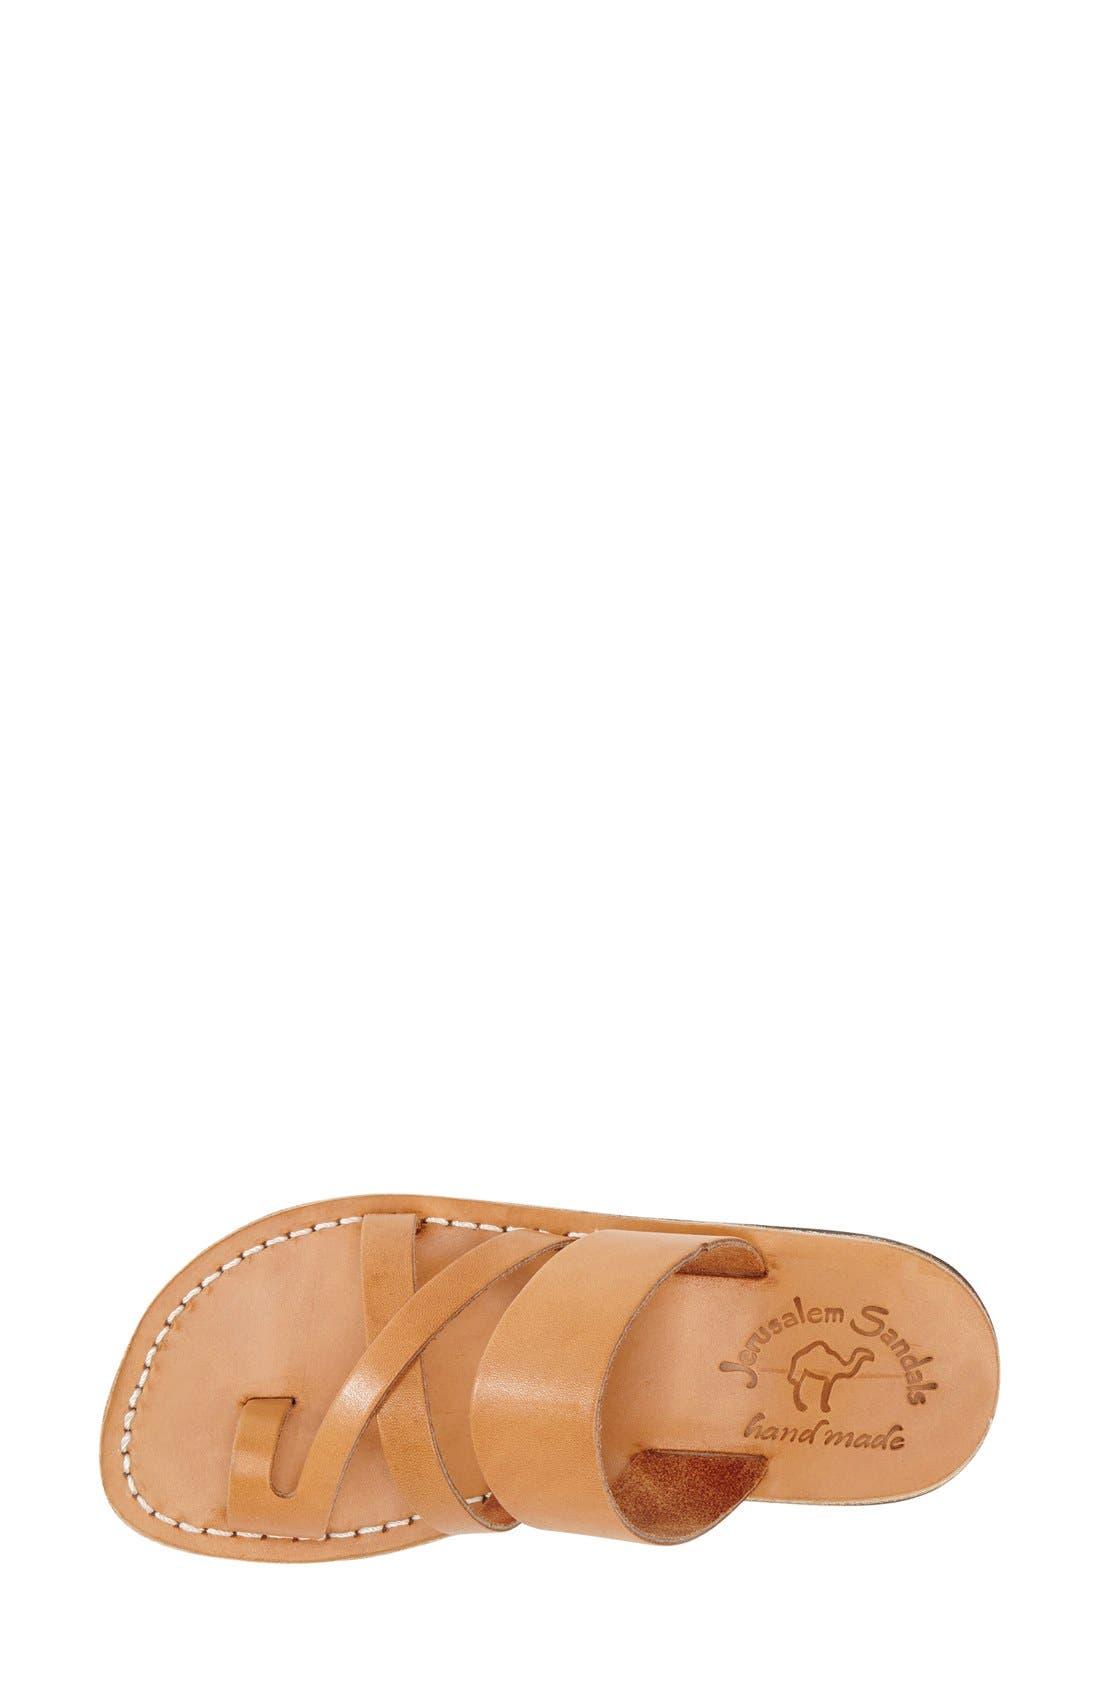 Alternate Image 3  - Jerusalem Sandals 'The Good Shepard' Leather Sandal (Women)